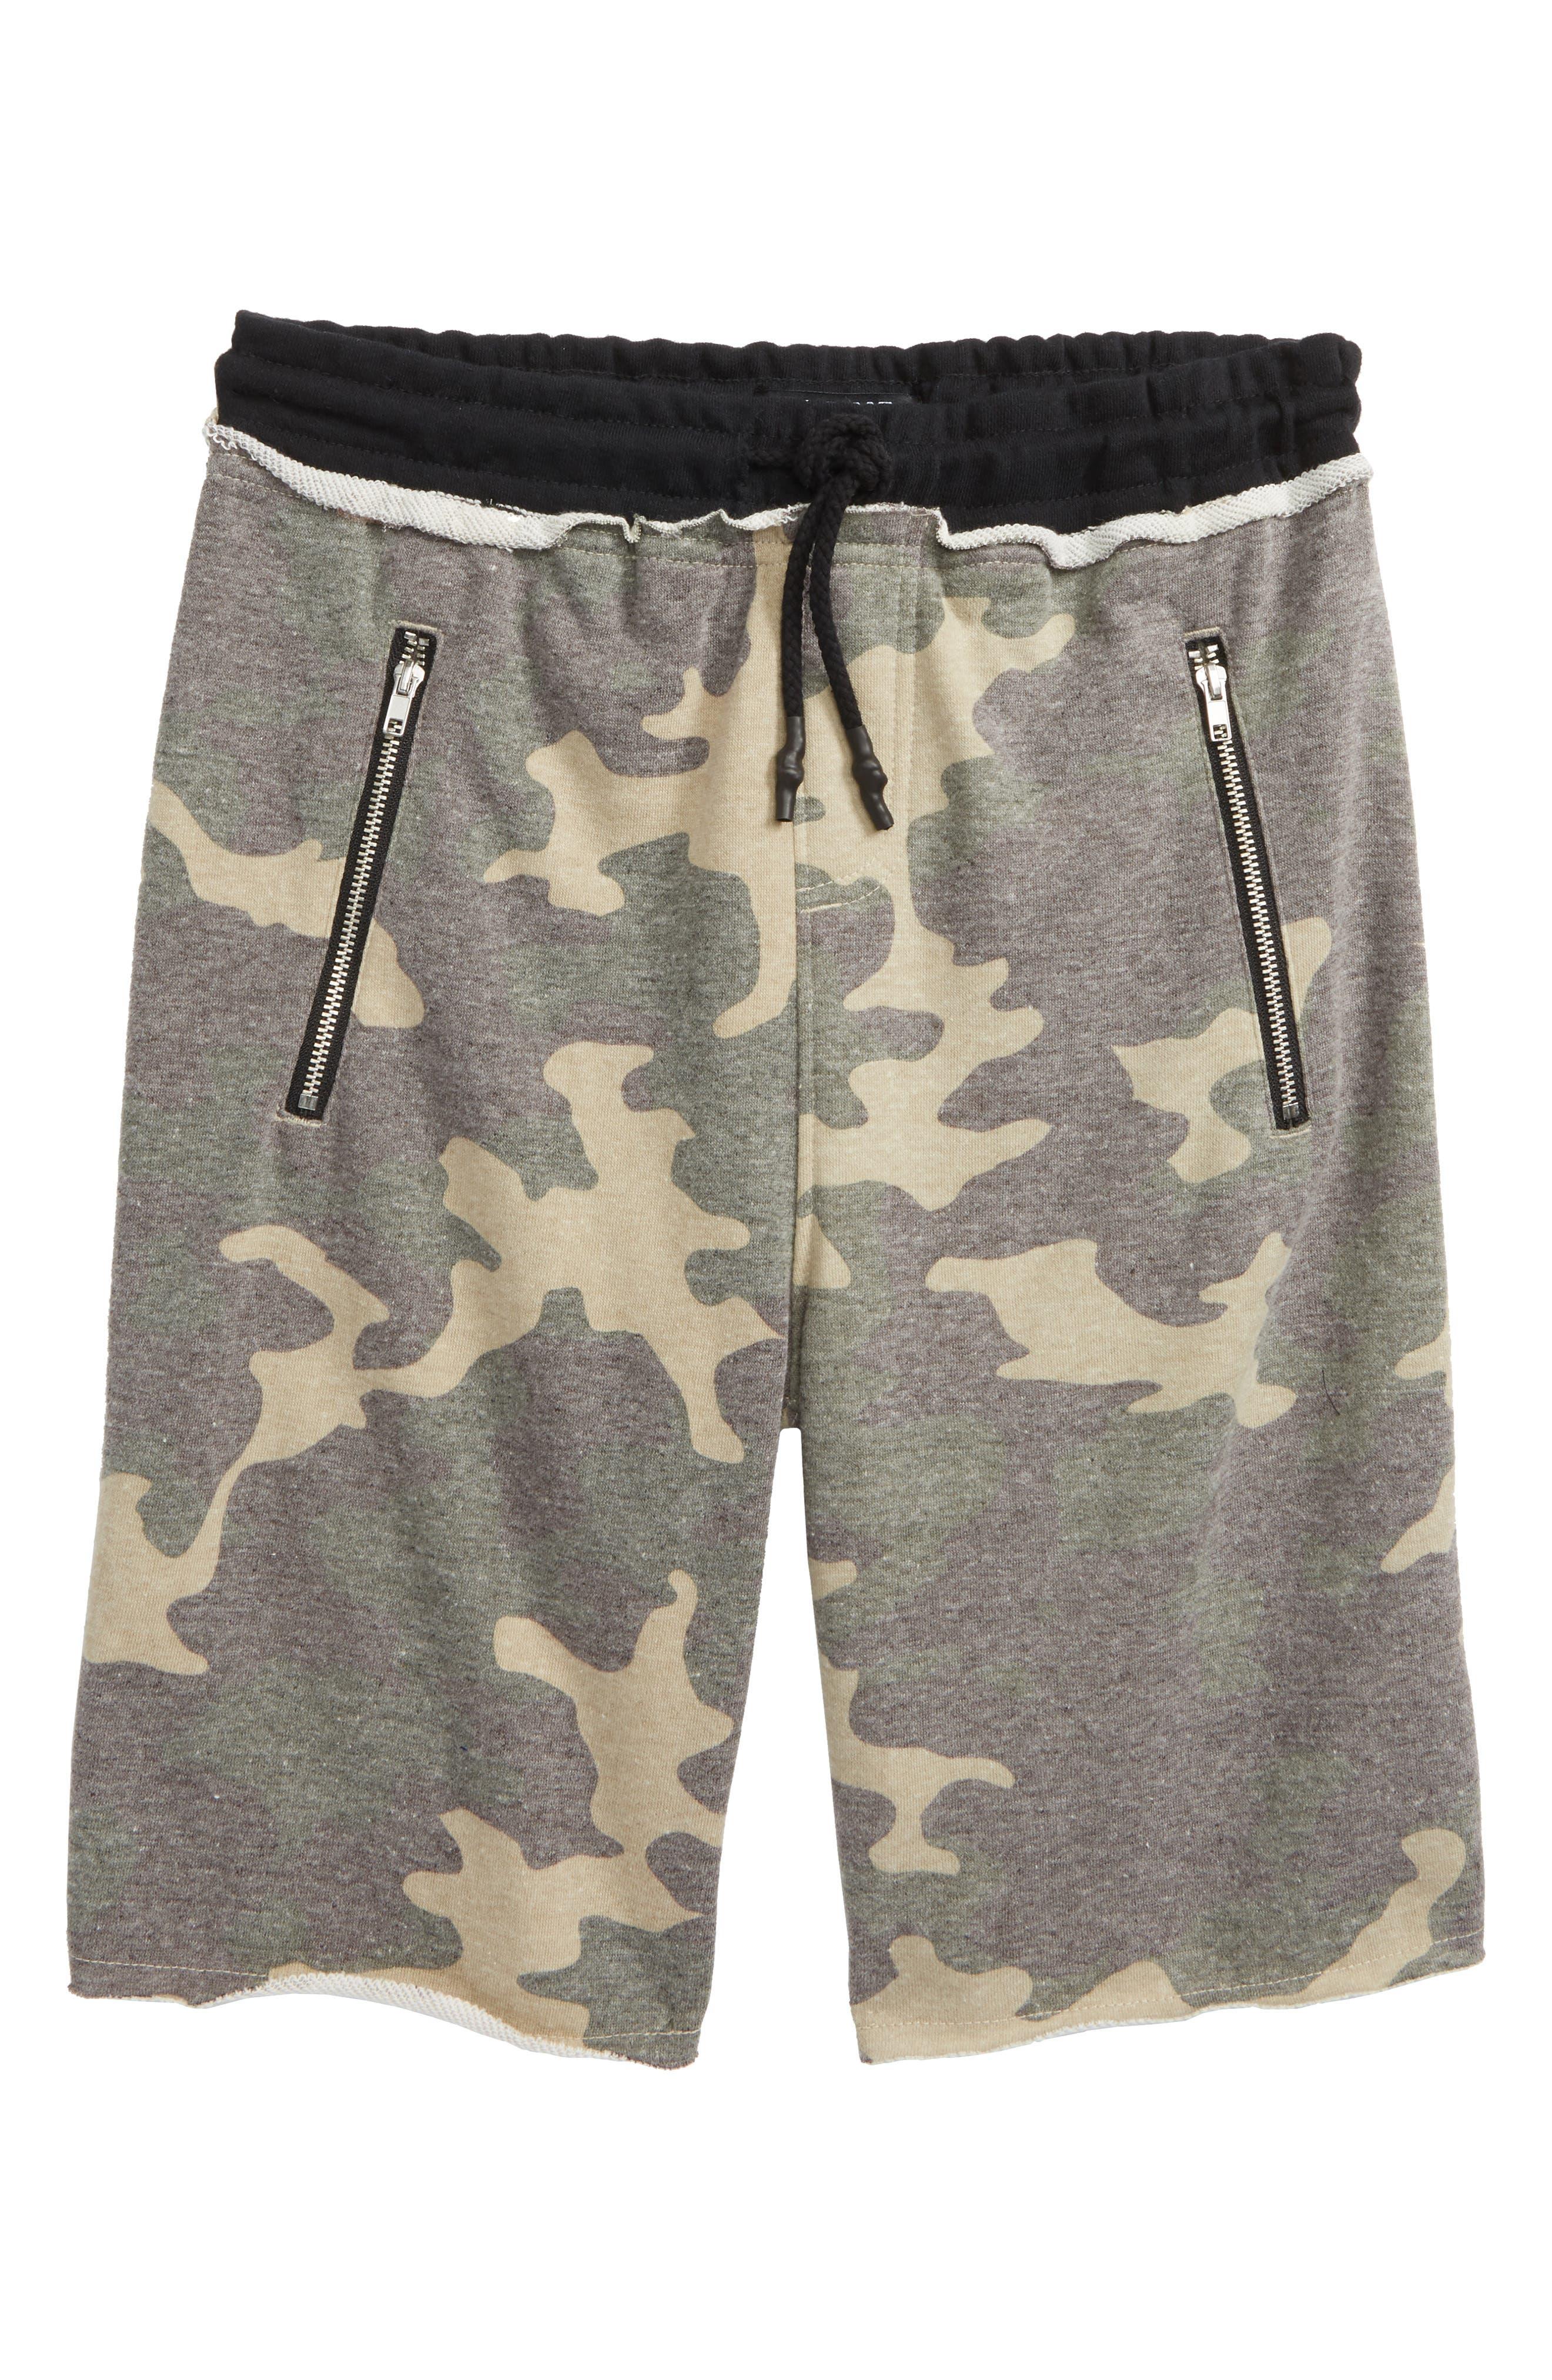 Raw Edge Shorts,                         Main,                         color, Camo/ Black